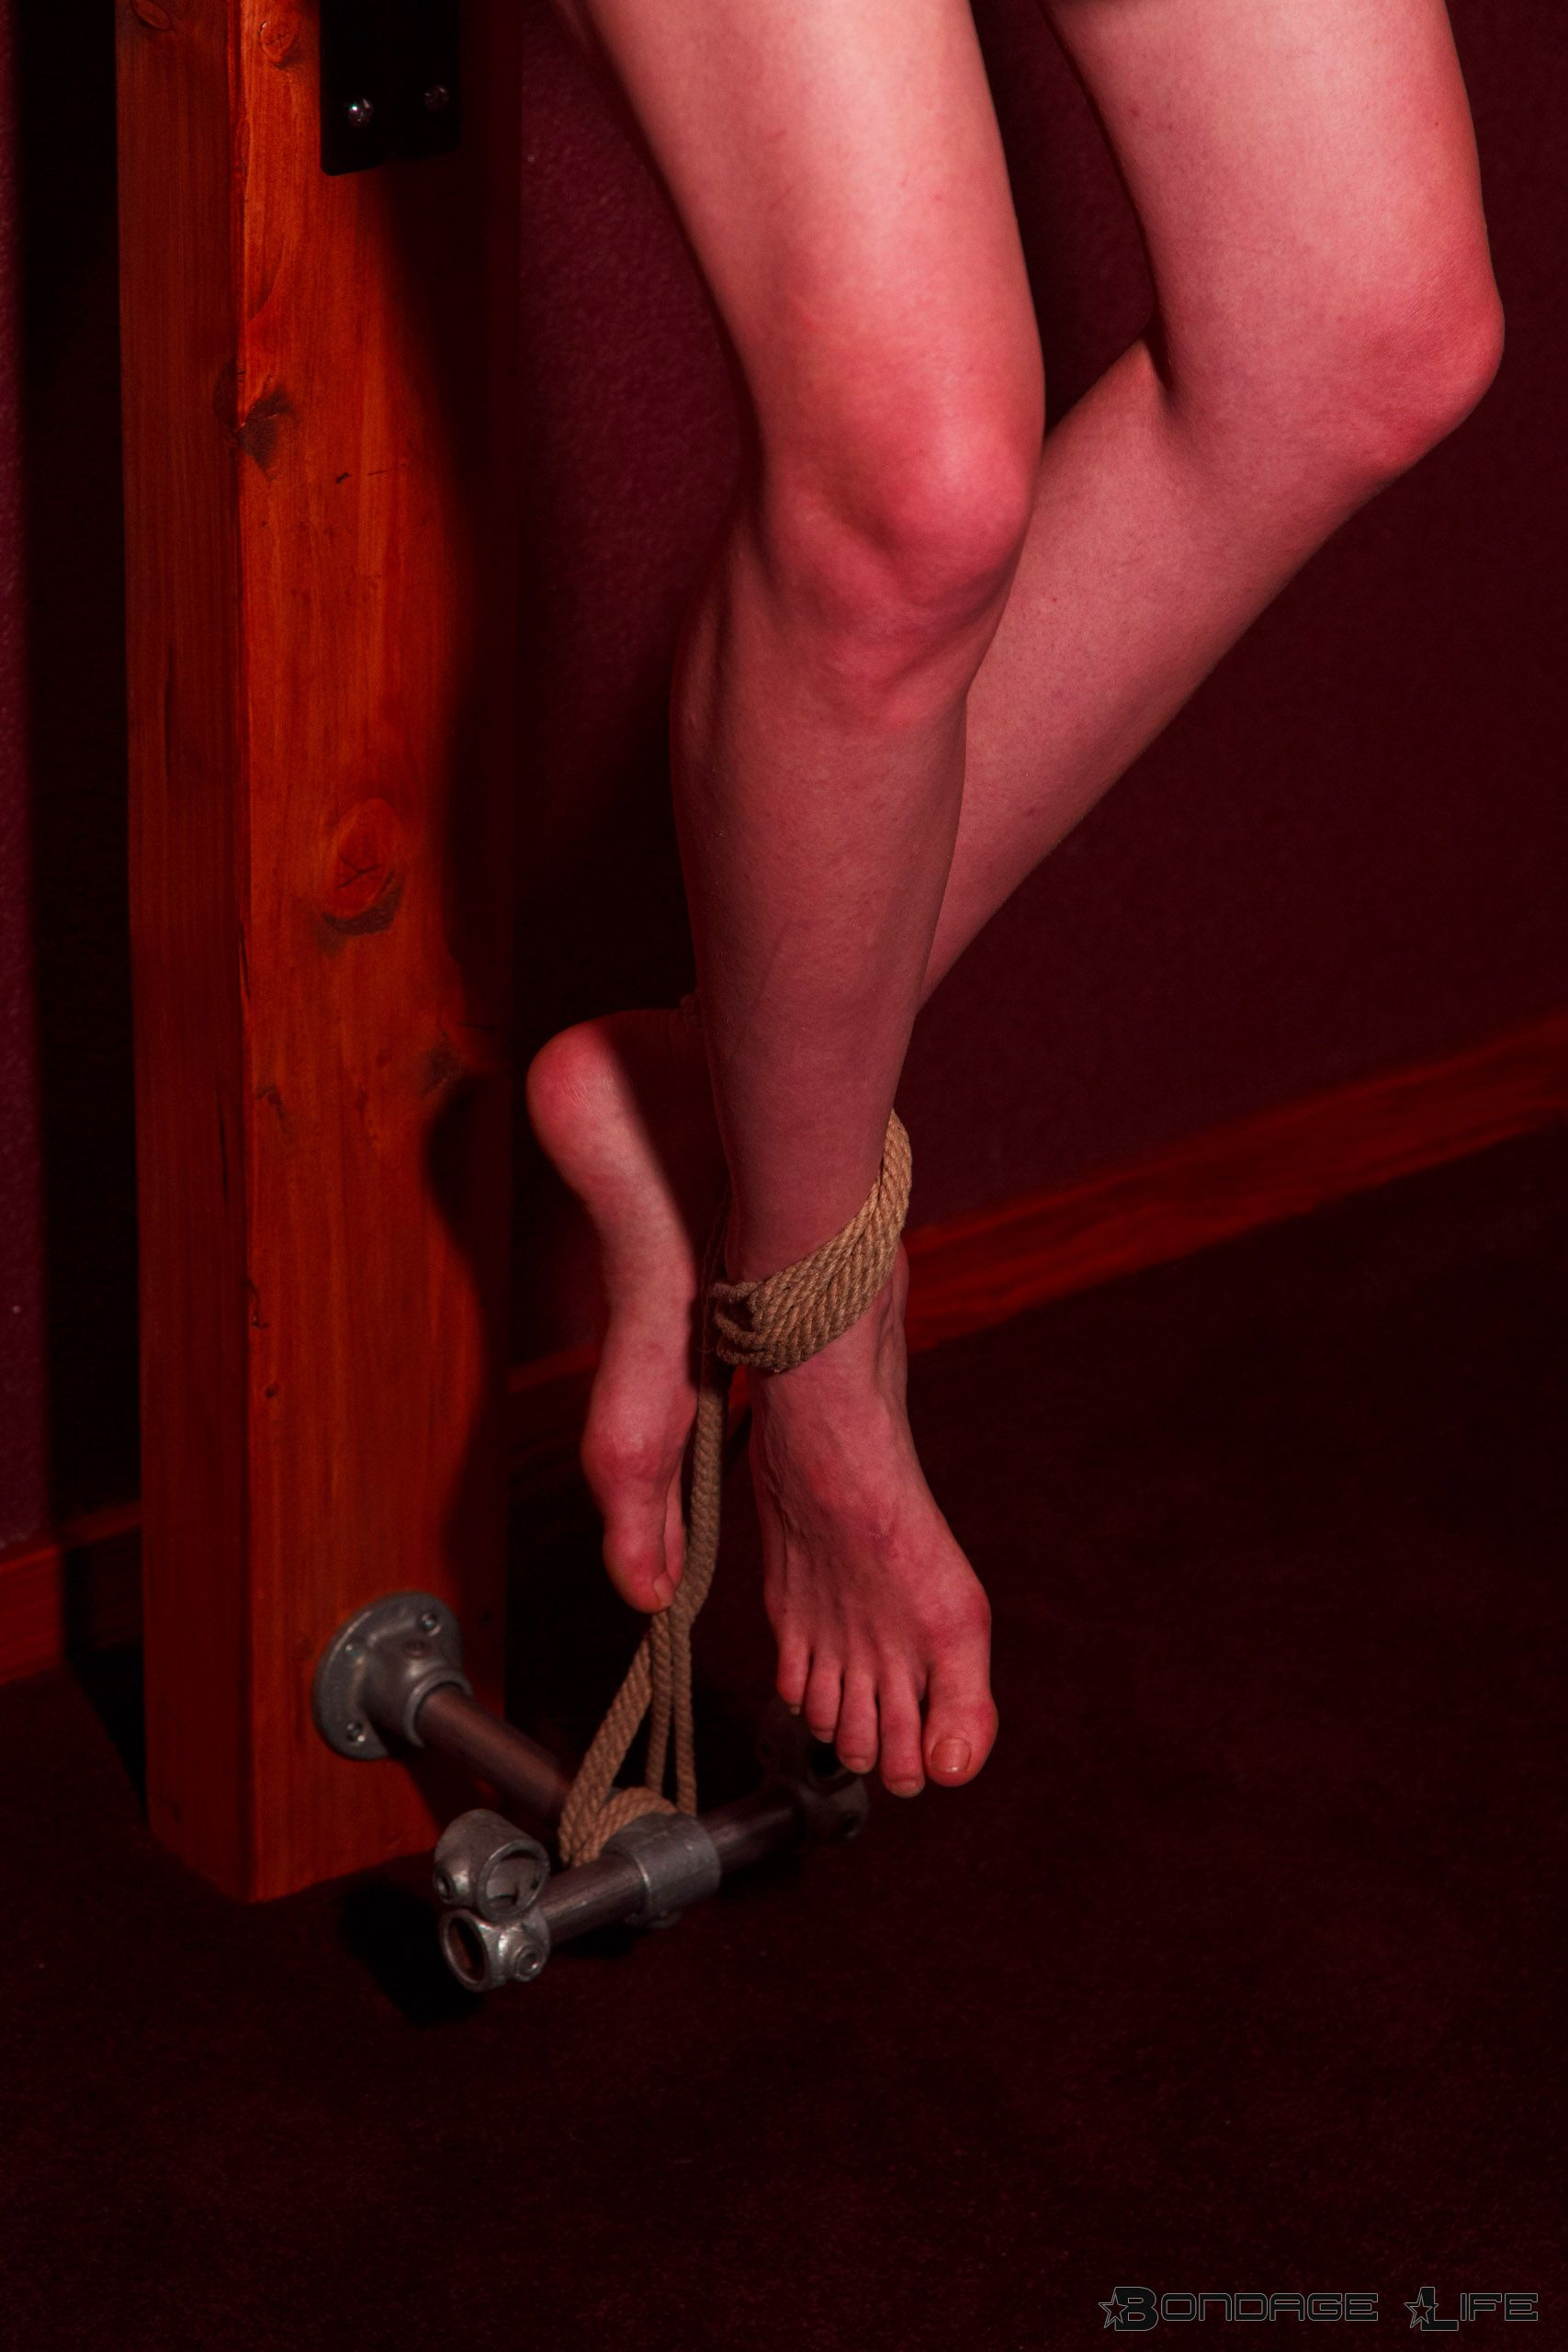 tied-up-feet